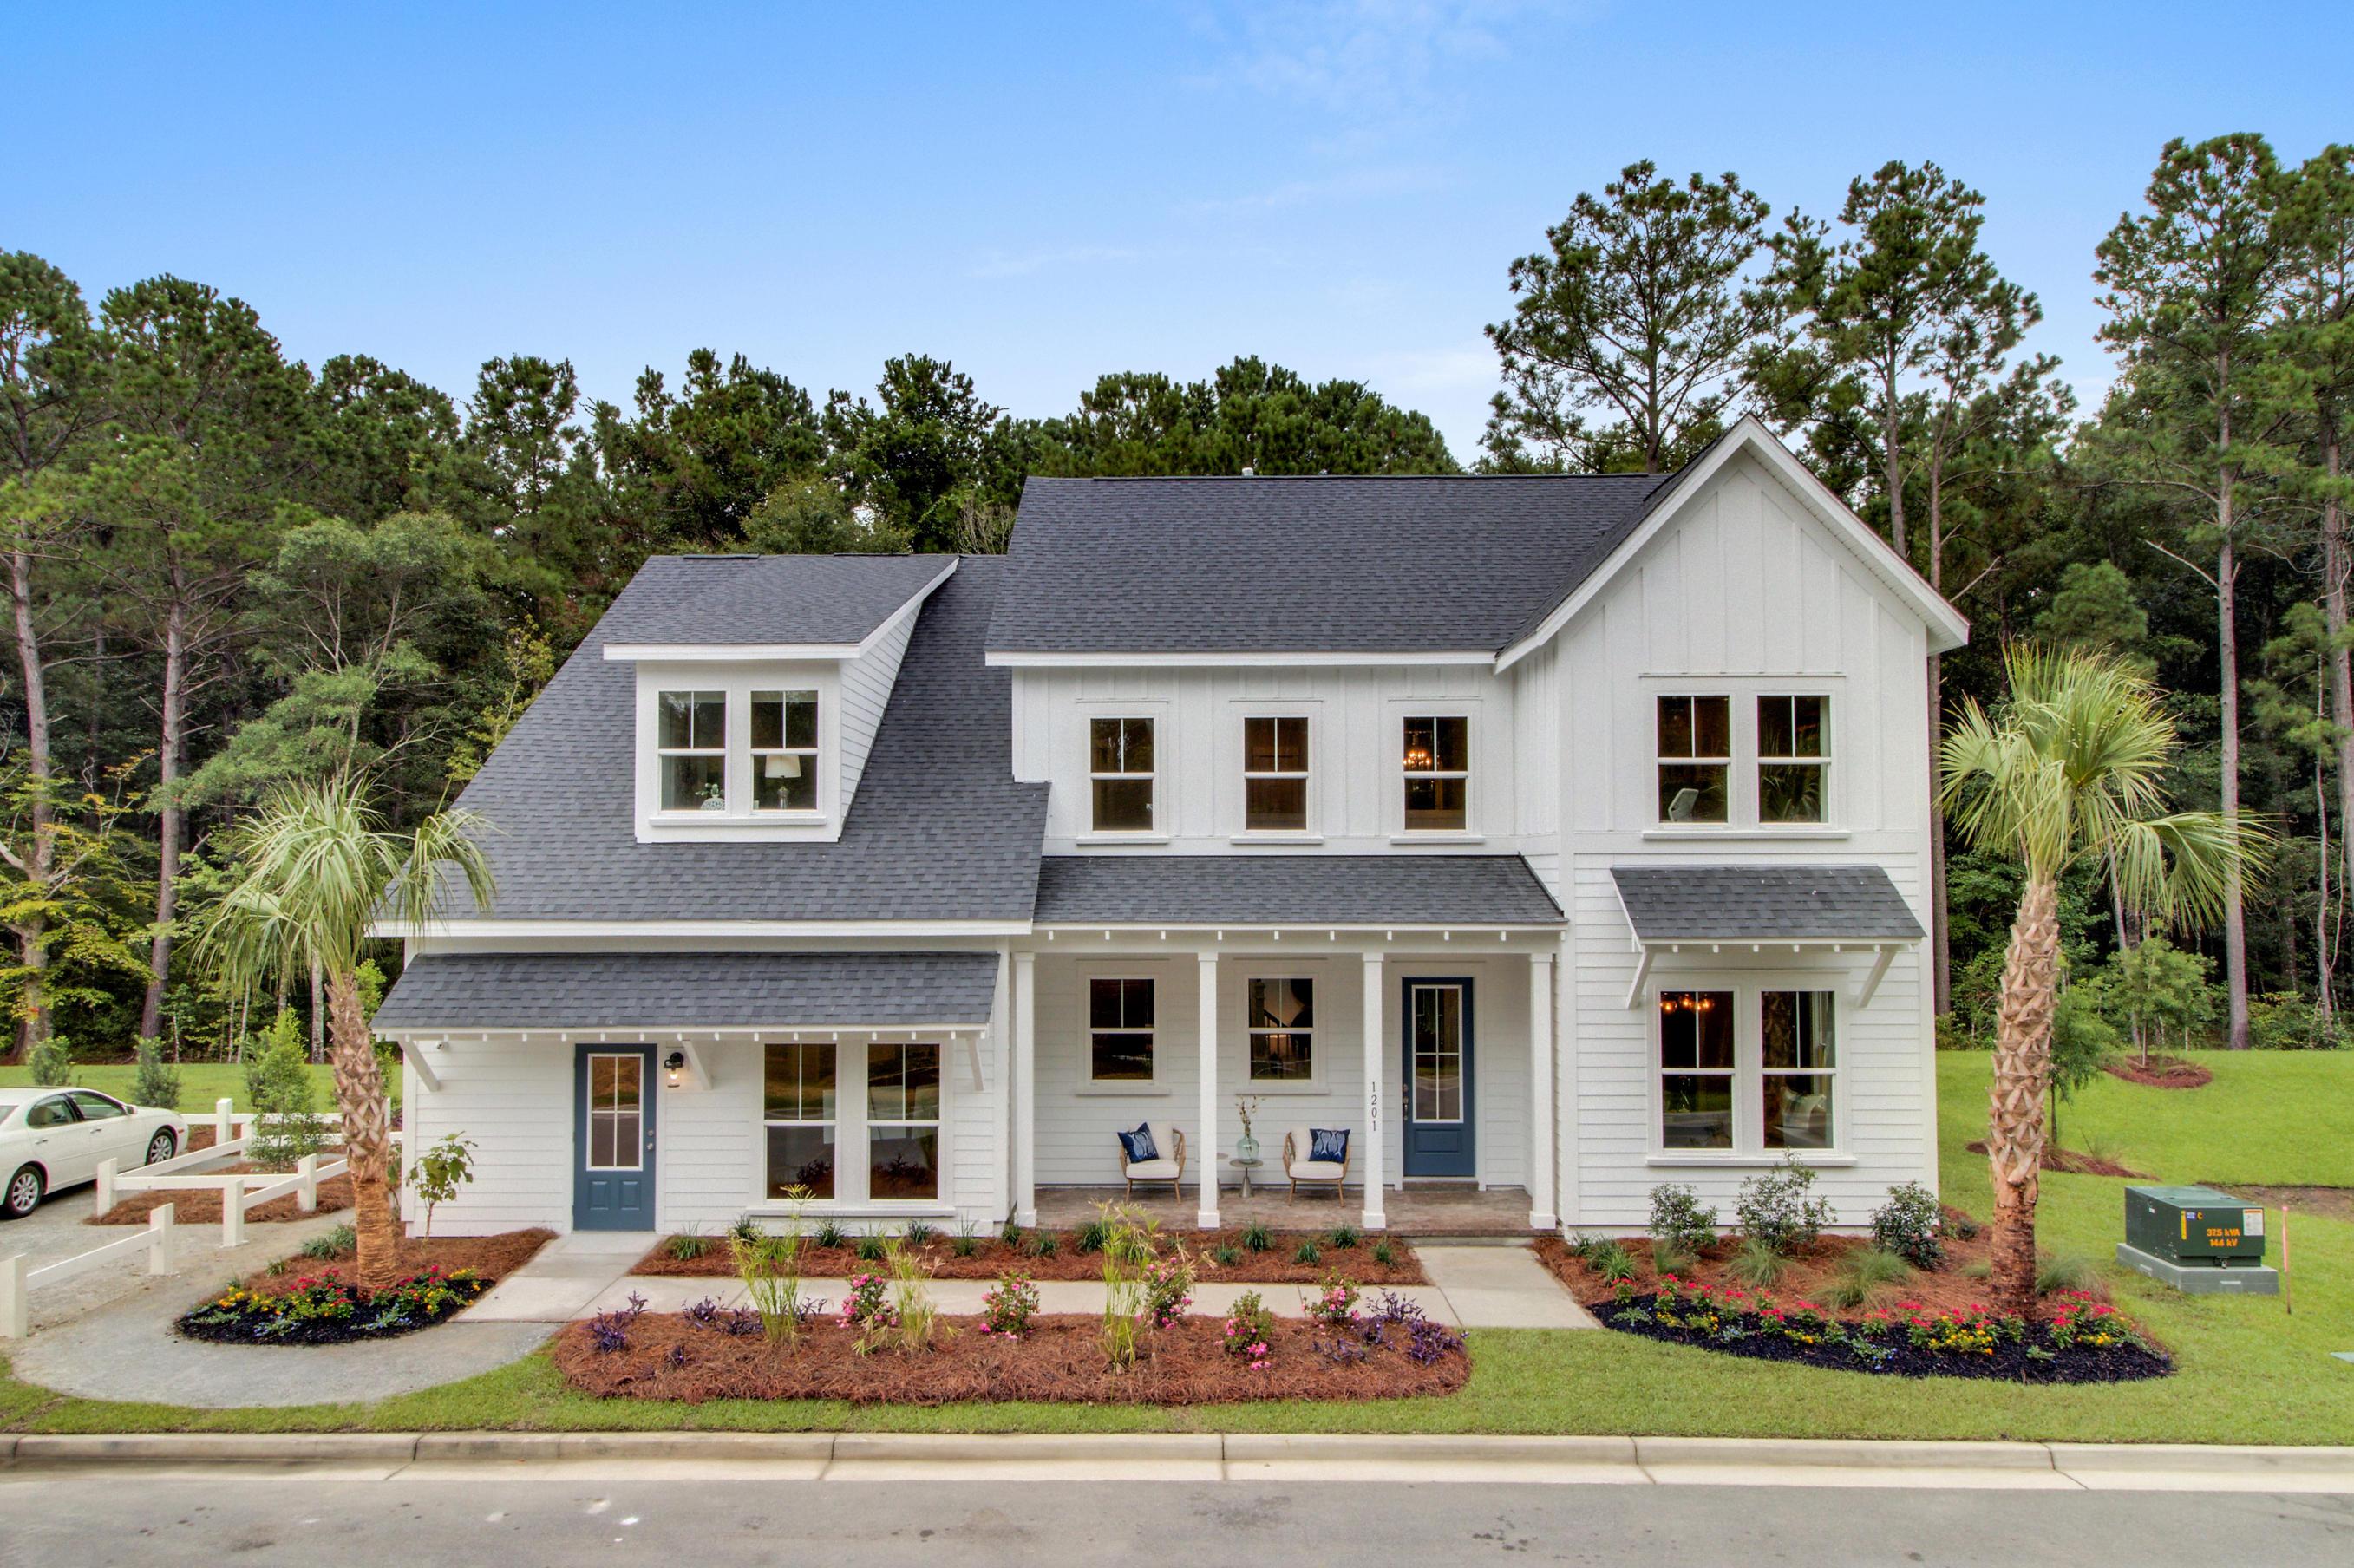 Fulton Park Homes For Sale - 1201 Max, Mount Pleasant, SC - 5